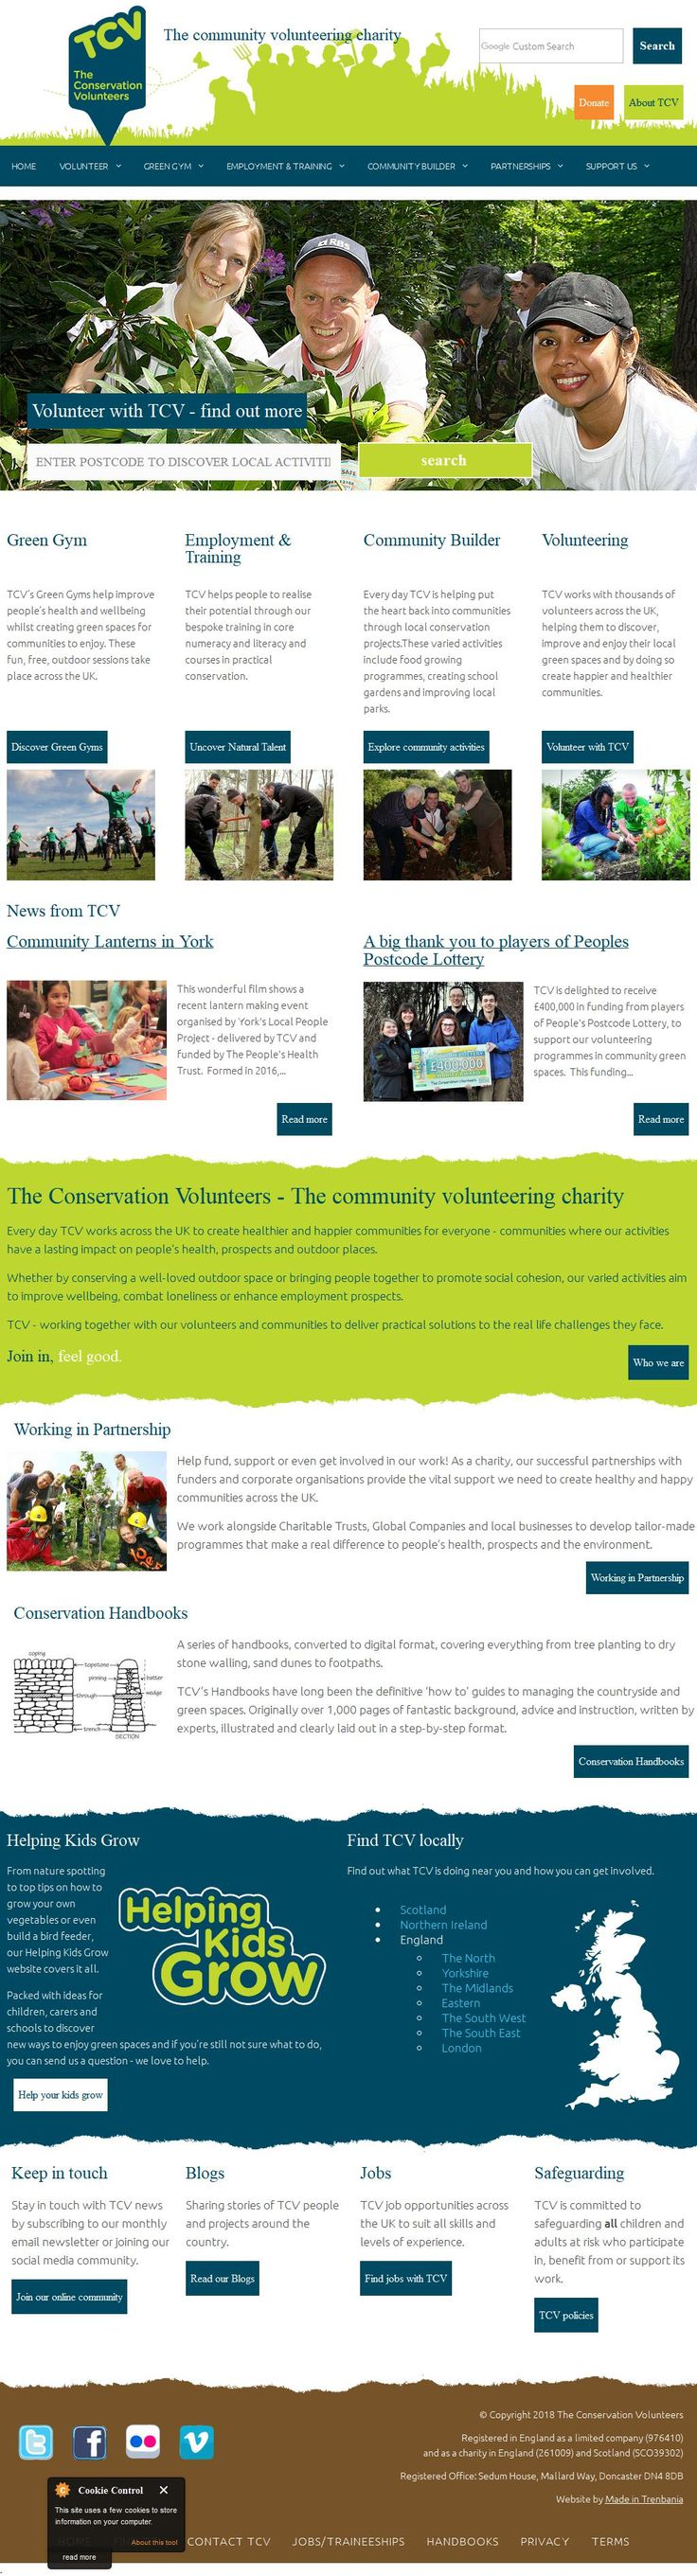 BTCV Enterprises Conservation Organisations Conservation Centre 163 Balby Road  Doncaster South Yorkshire DN4 0RH | To get more infomration about BTCV Enterprises, Location Map, Phone numbers, Email, Website please visit http://www.HaiUK.co.uk